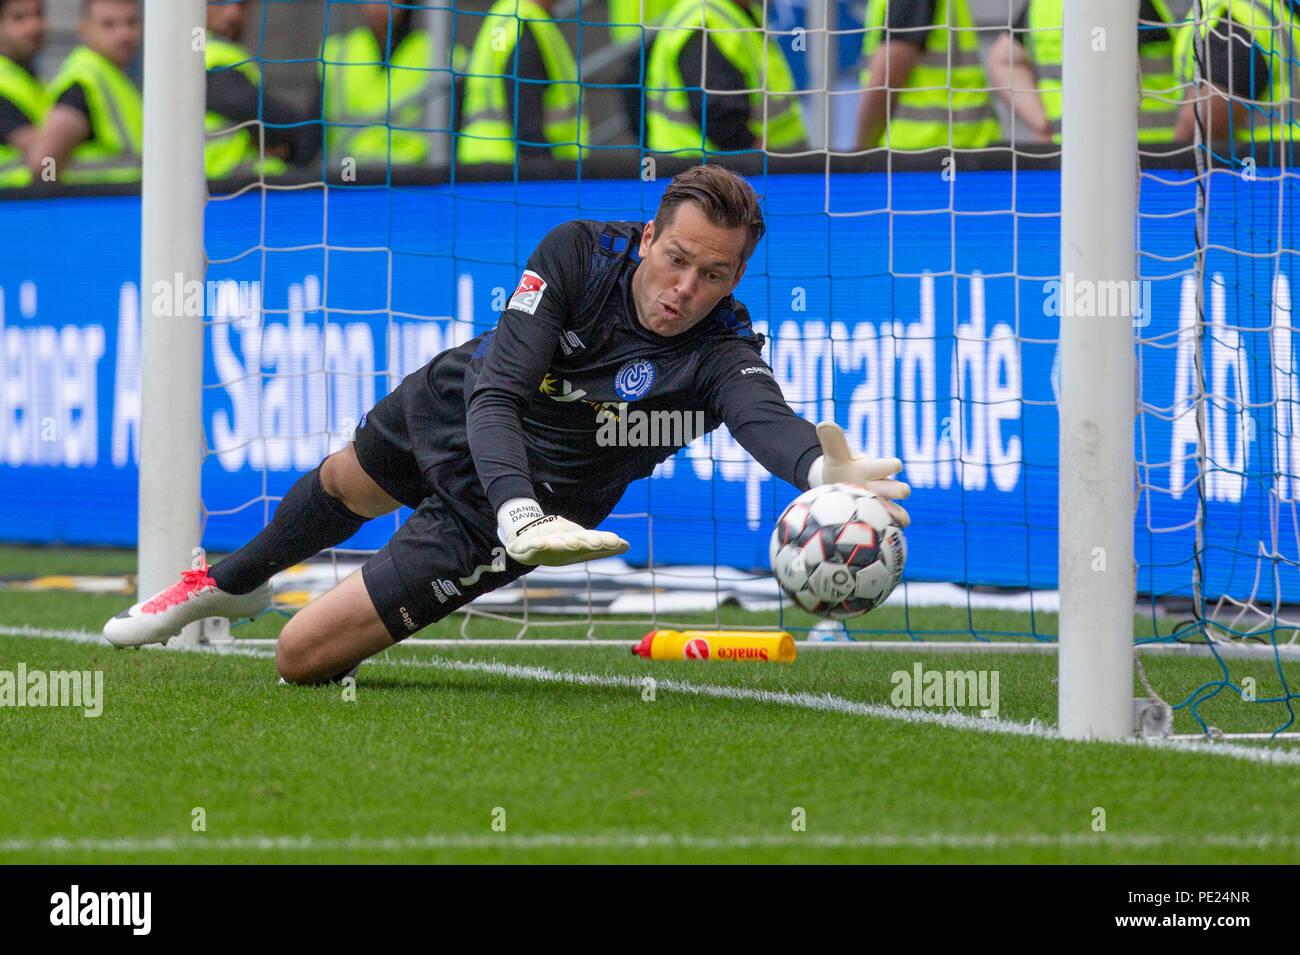 Duisburg, Germany August 11 2018, 2nd league, MSV Duisburg vs VfL Bochum:  Goalkeeper Daniel Davari (MSV) in action beim 0-1.                 Credit: Juergen Schwarz/Alamy Live News - Stock Image